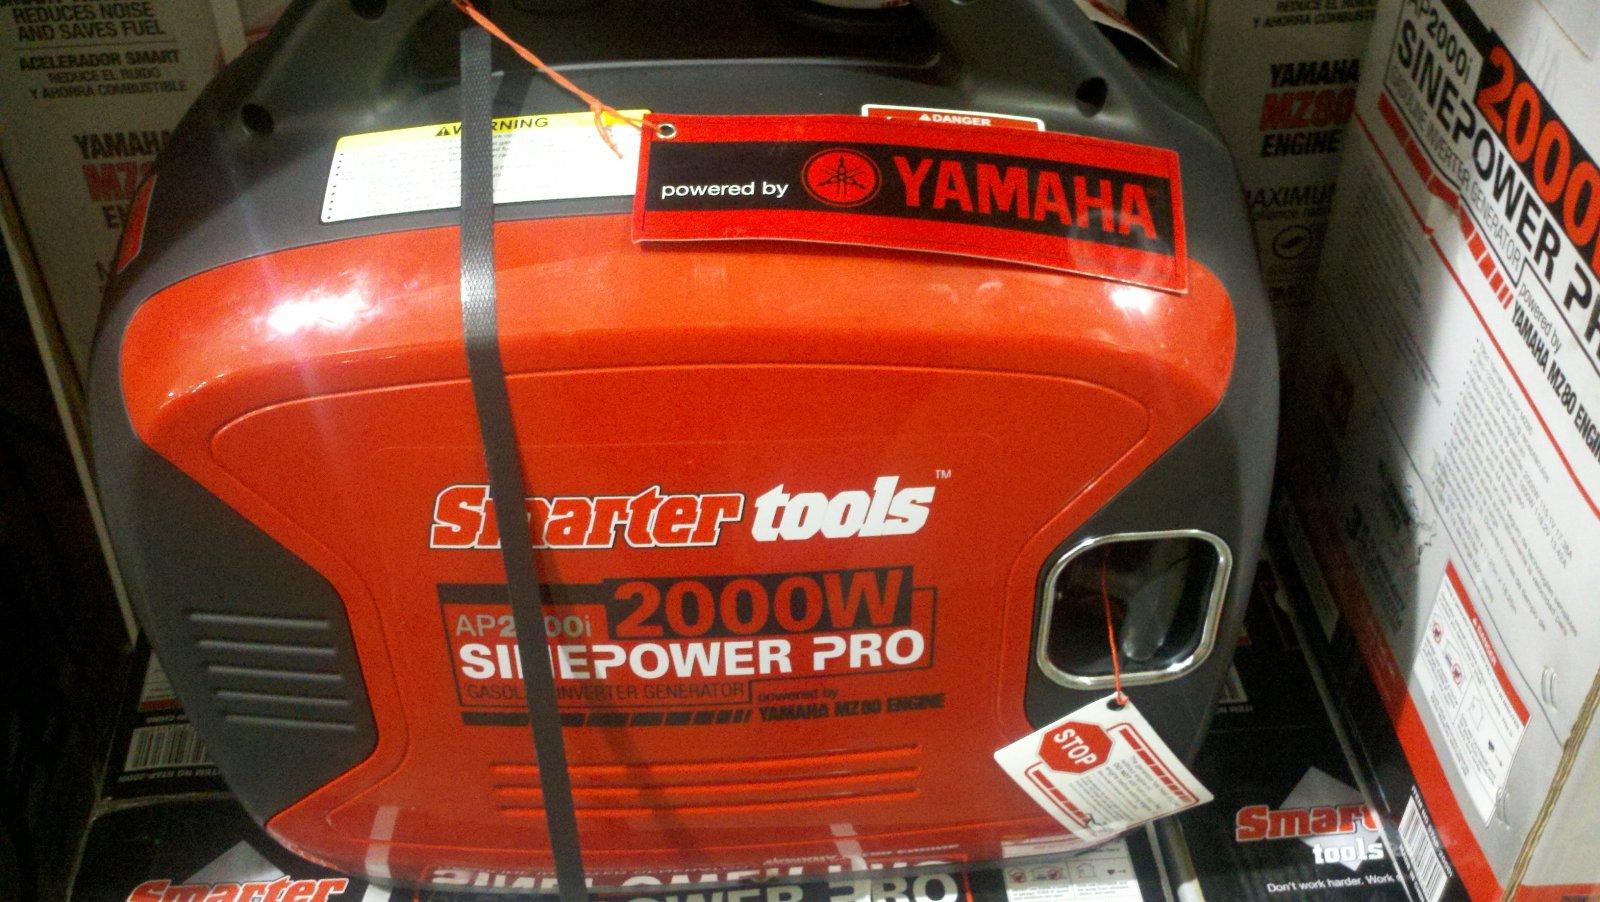 New Costco Yamaha Powered Generator - Airstream Forums